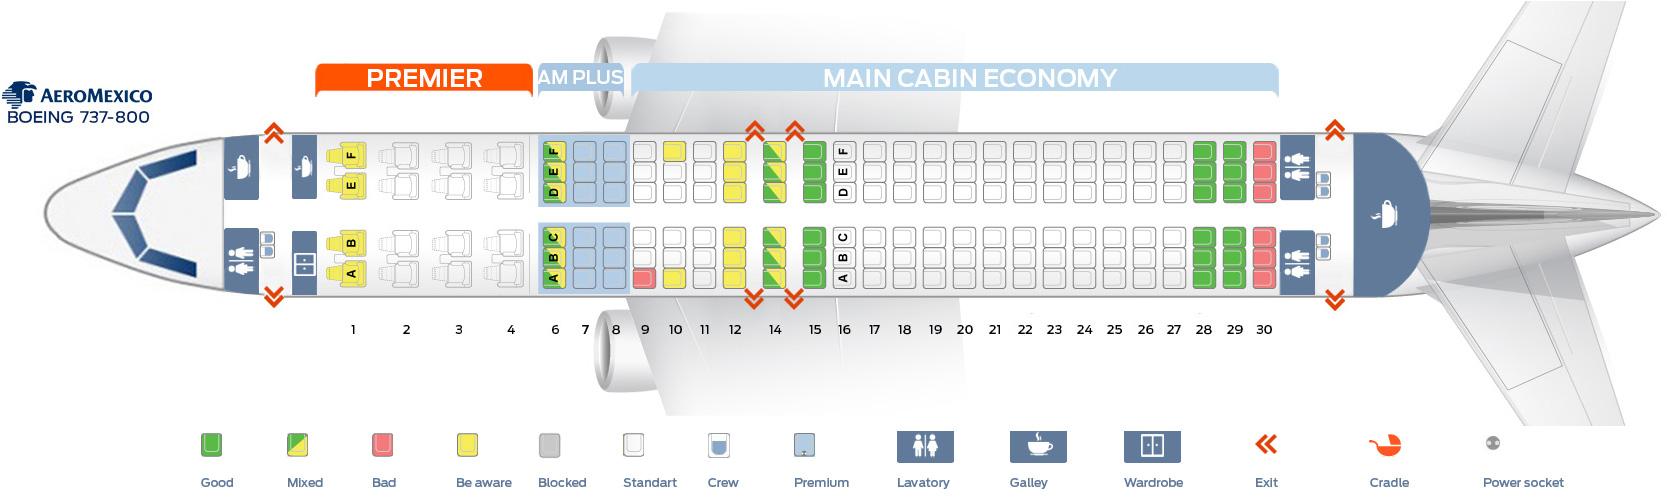 Seat map Boeing 737-800 Aeromexico